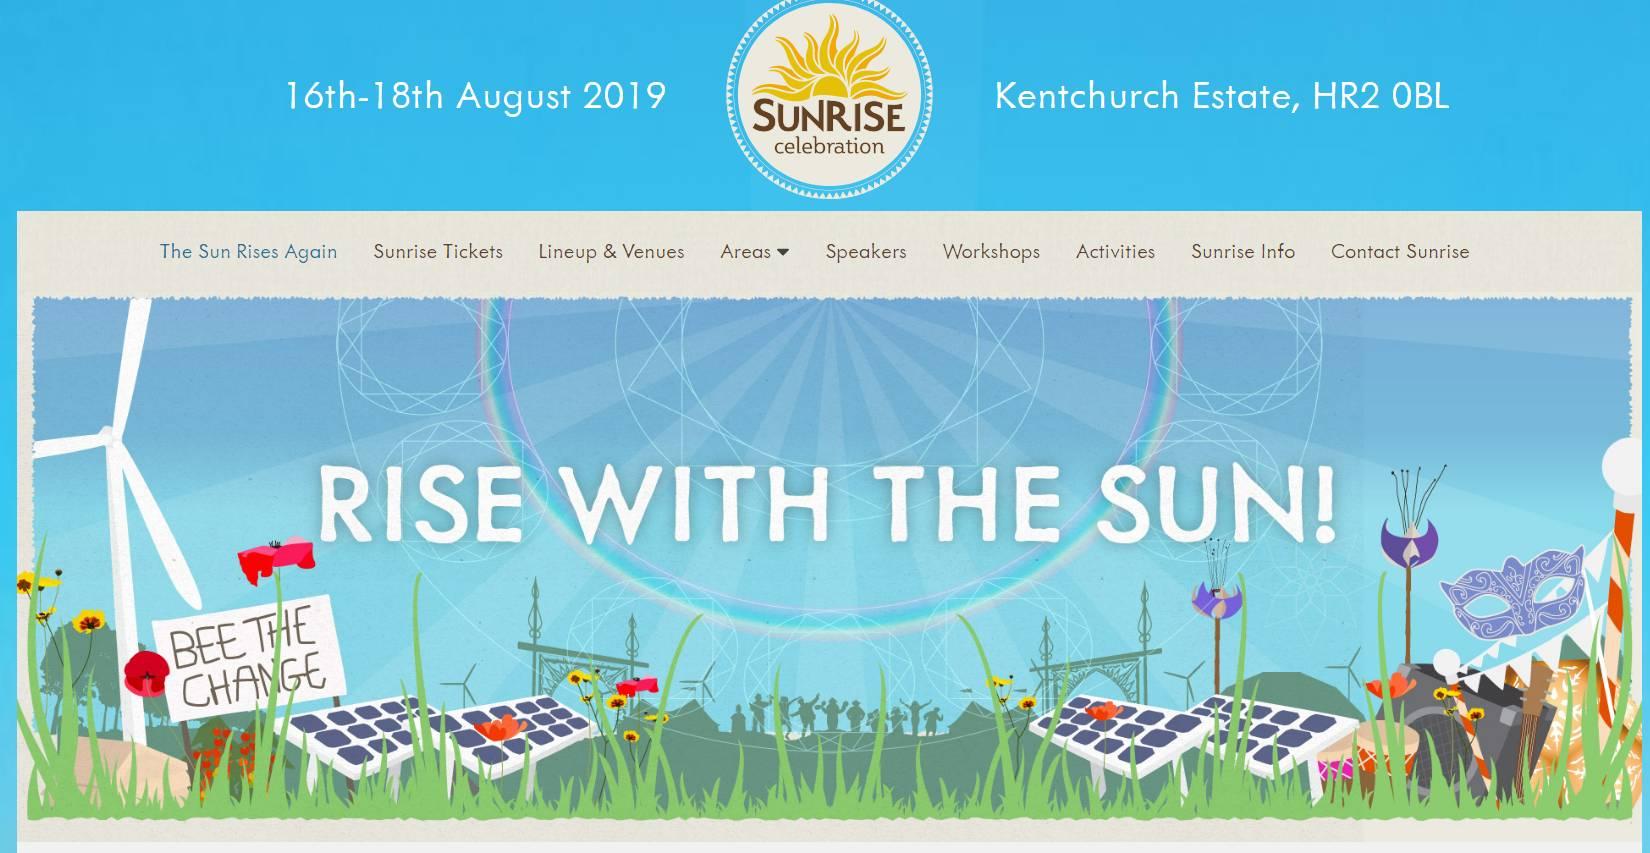 Sunrise_Celebration_–_Celebrate_the_sun_-_2019-08-16_22.26.00.jpg